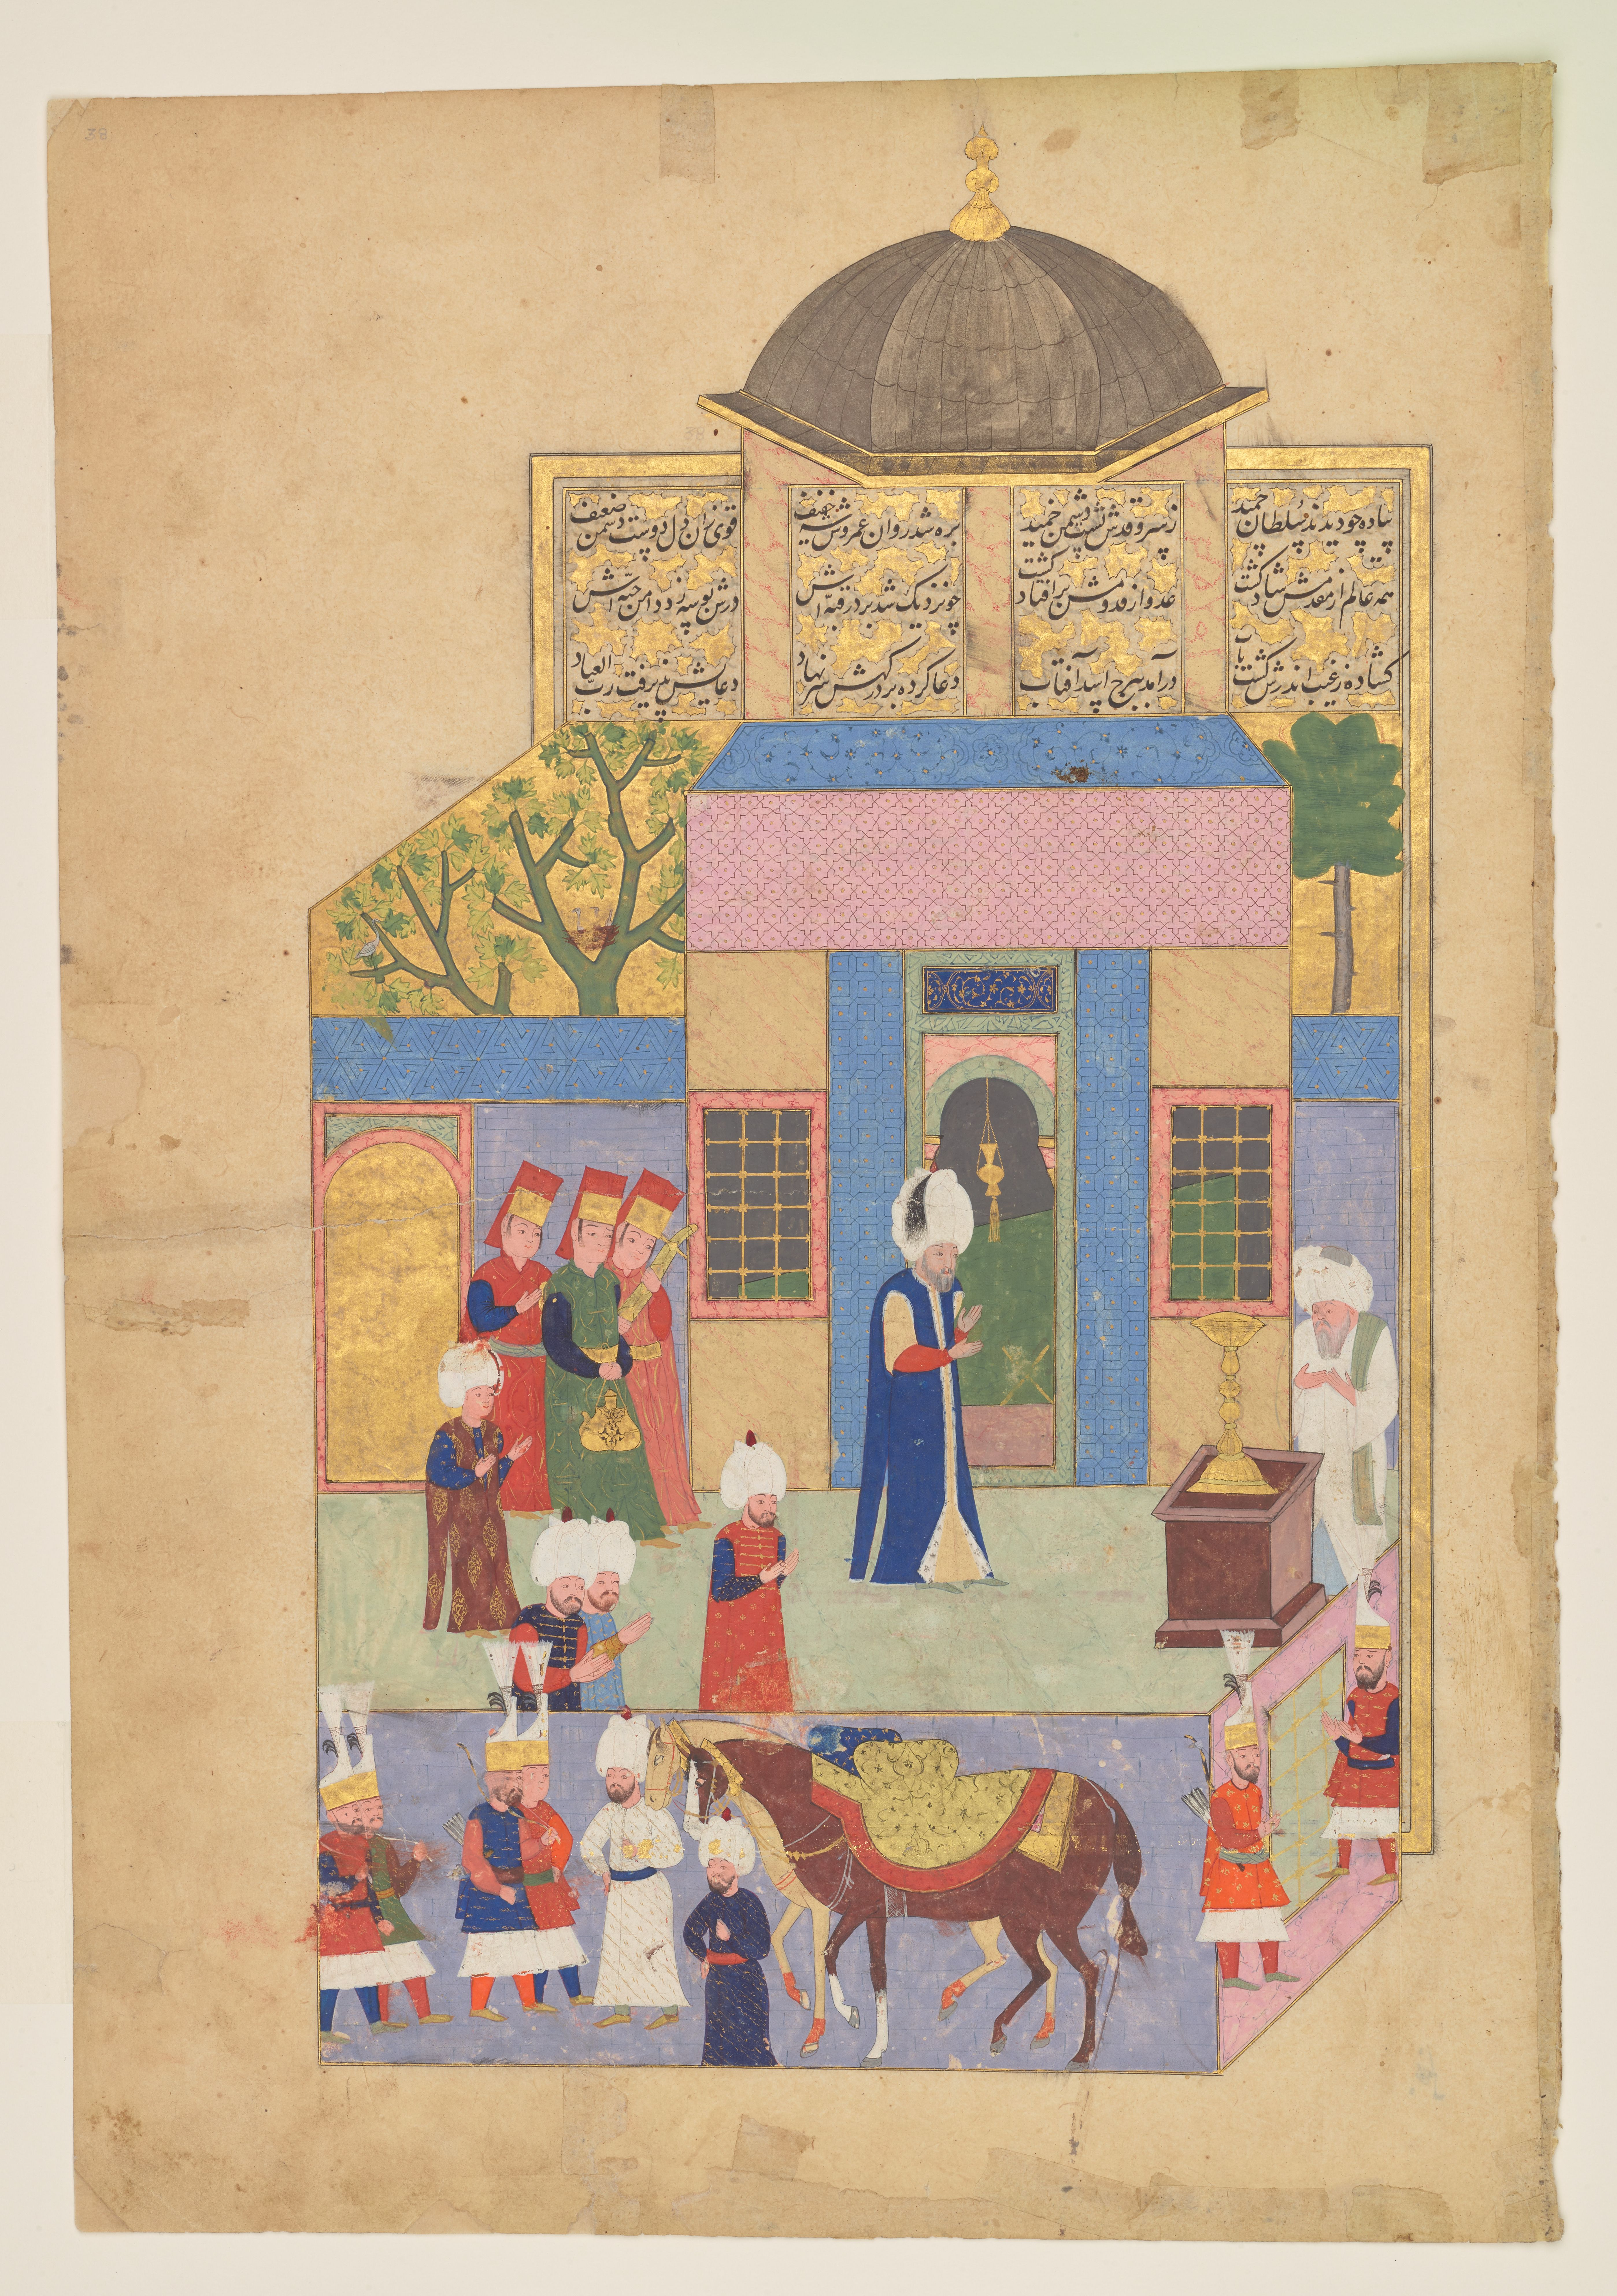 Süleyman's Pilgrimage to Eyüp, from the History of Sultan Süleyman by Sayyid Luqman